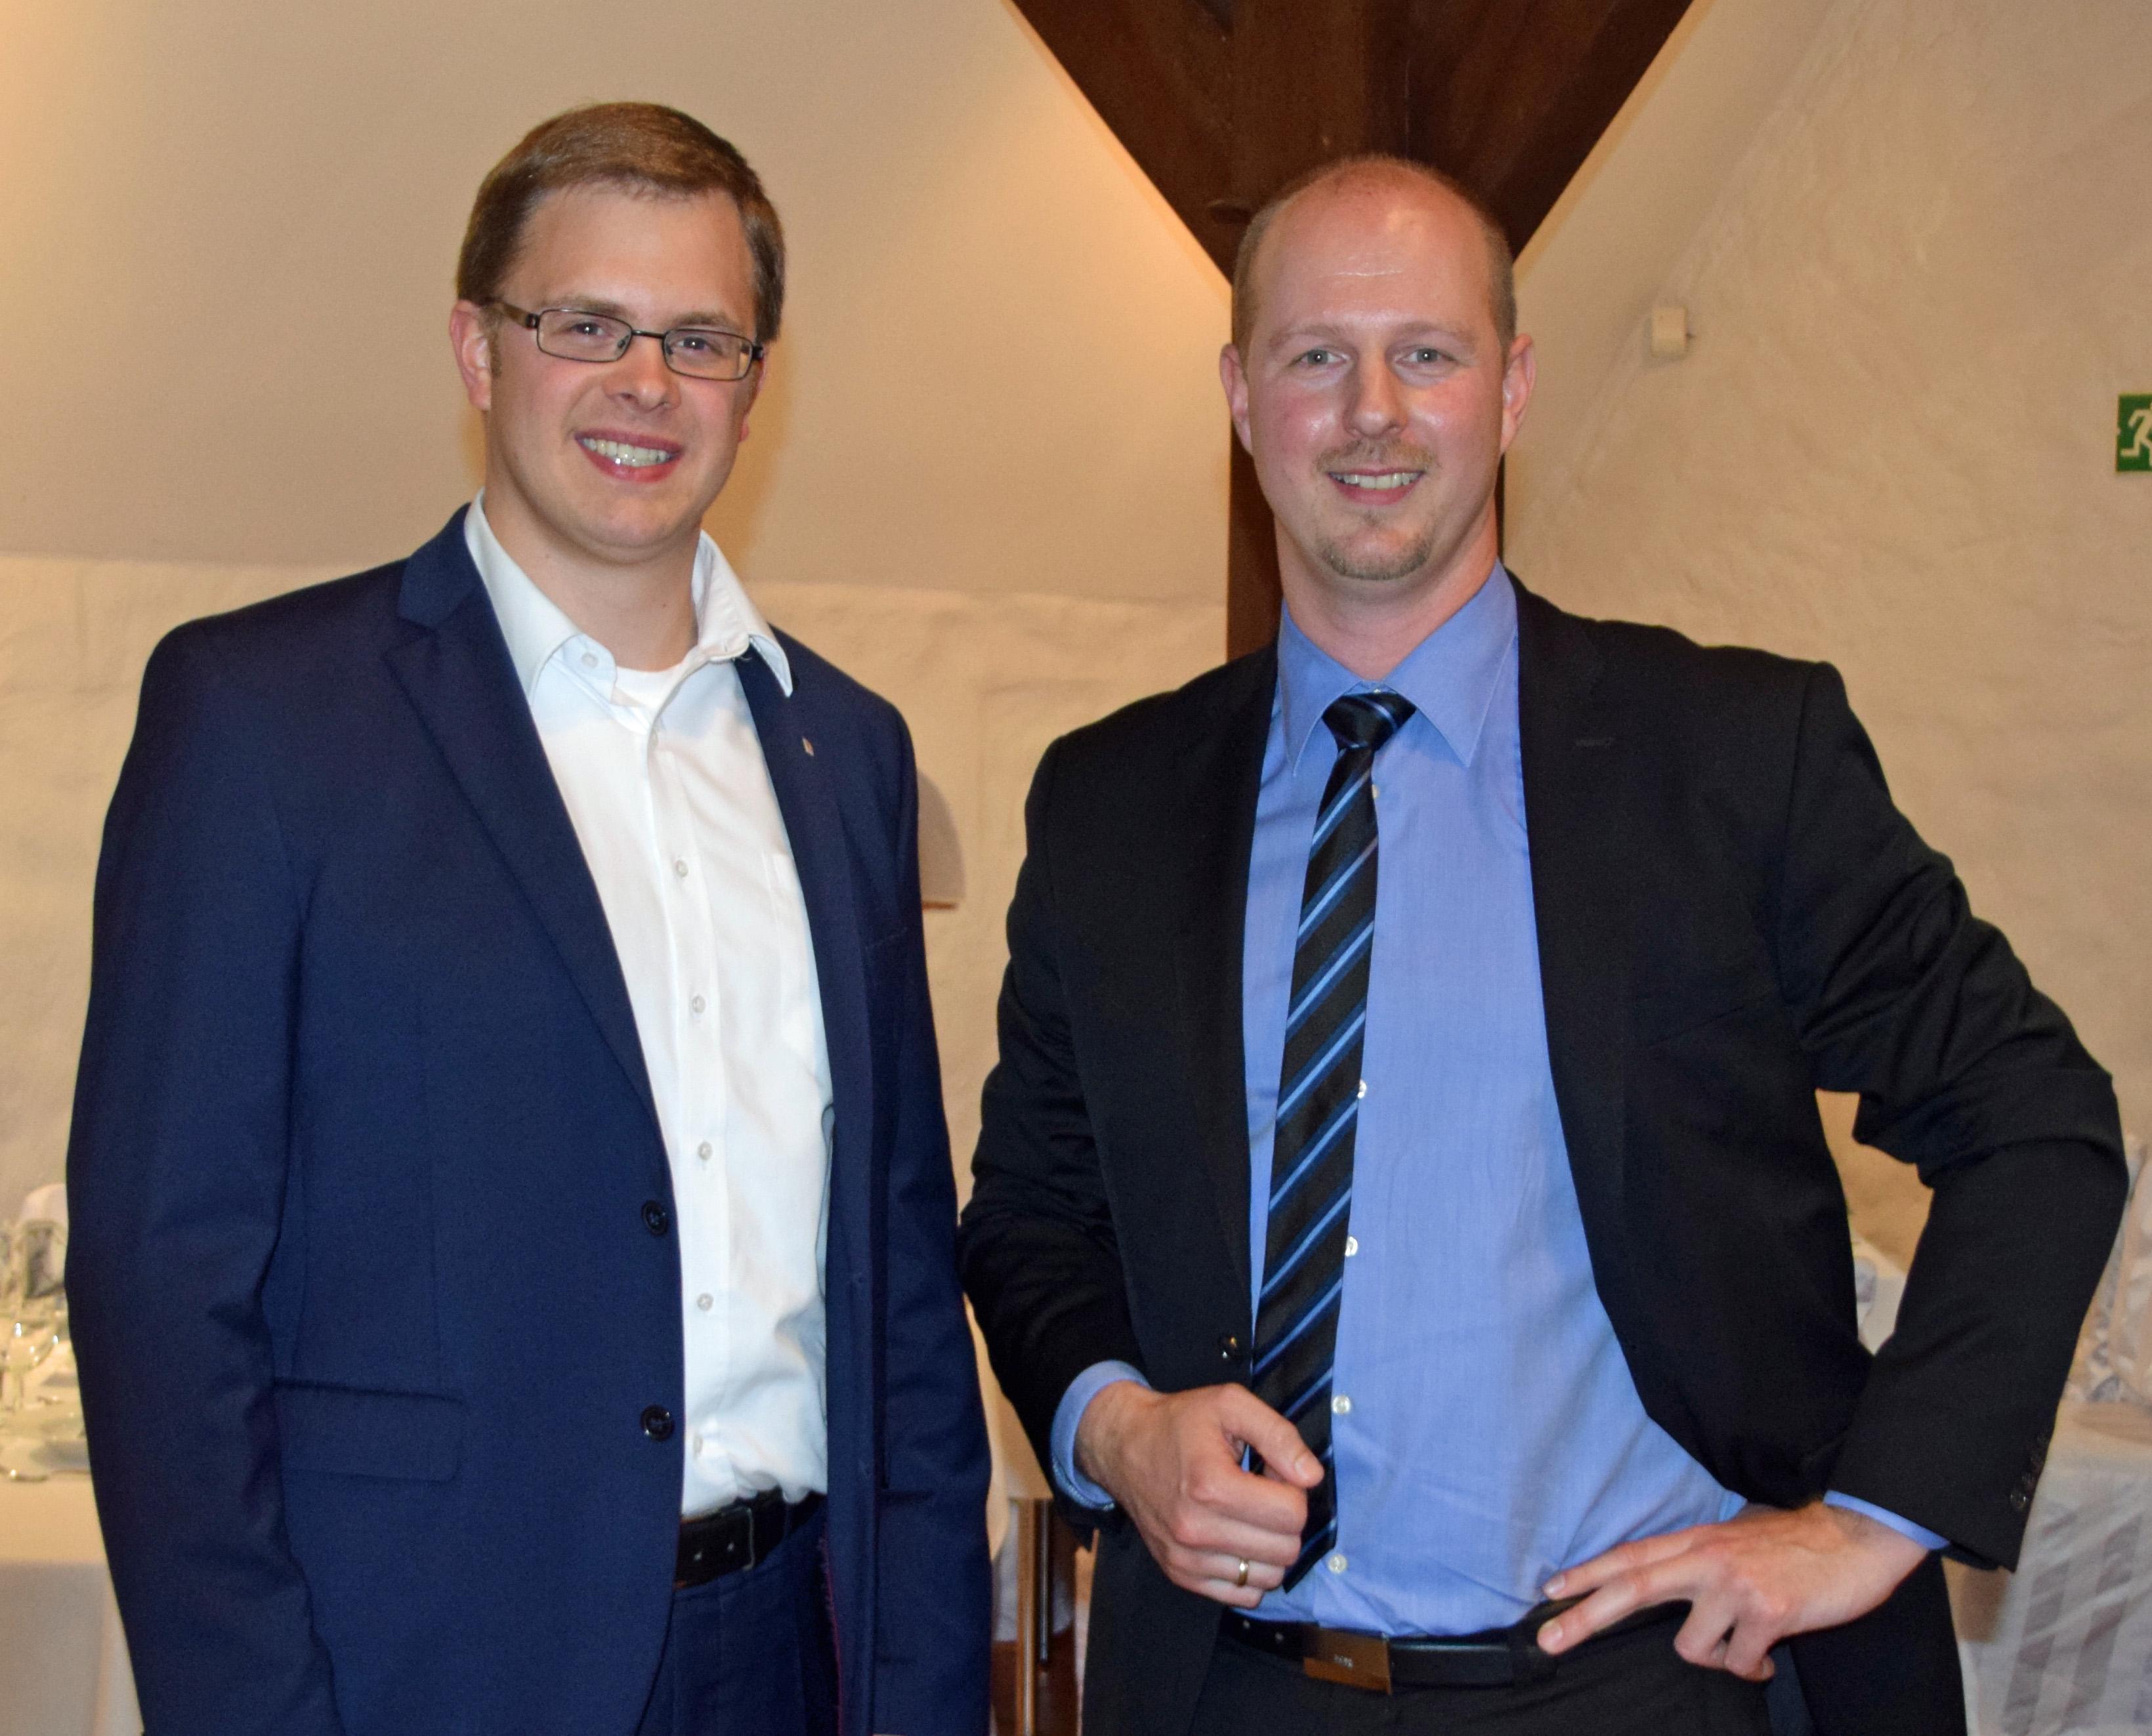 Landtagskandidat Ole-Christopher Plambeck gratuliert dem neu gewählten Ortsvorsitzenden der CDU Kaltenkirchen Thomas Kurz